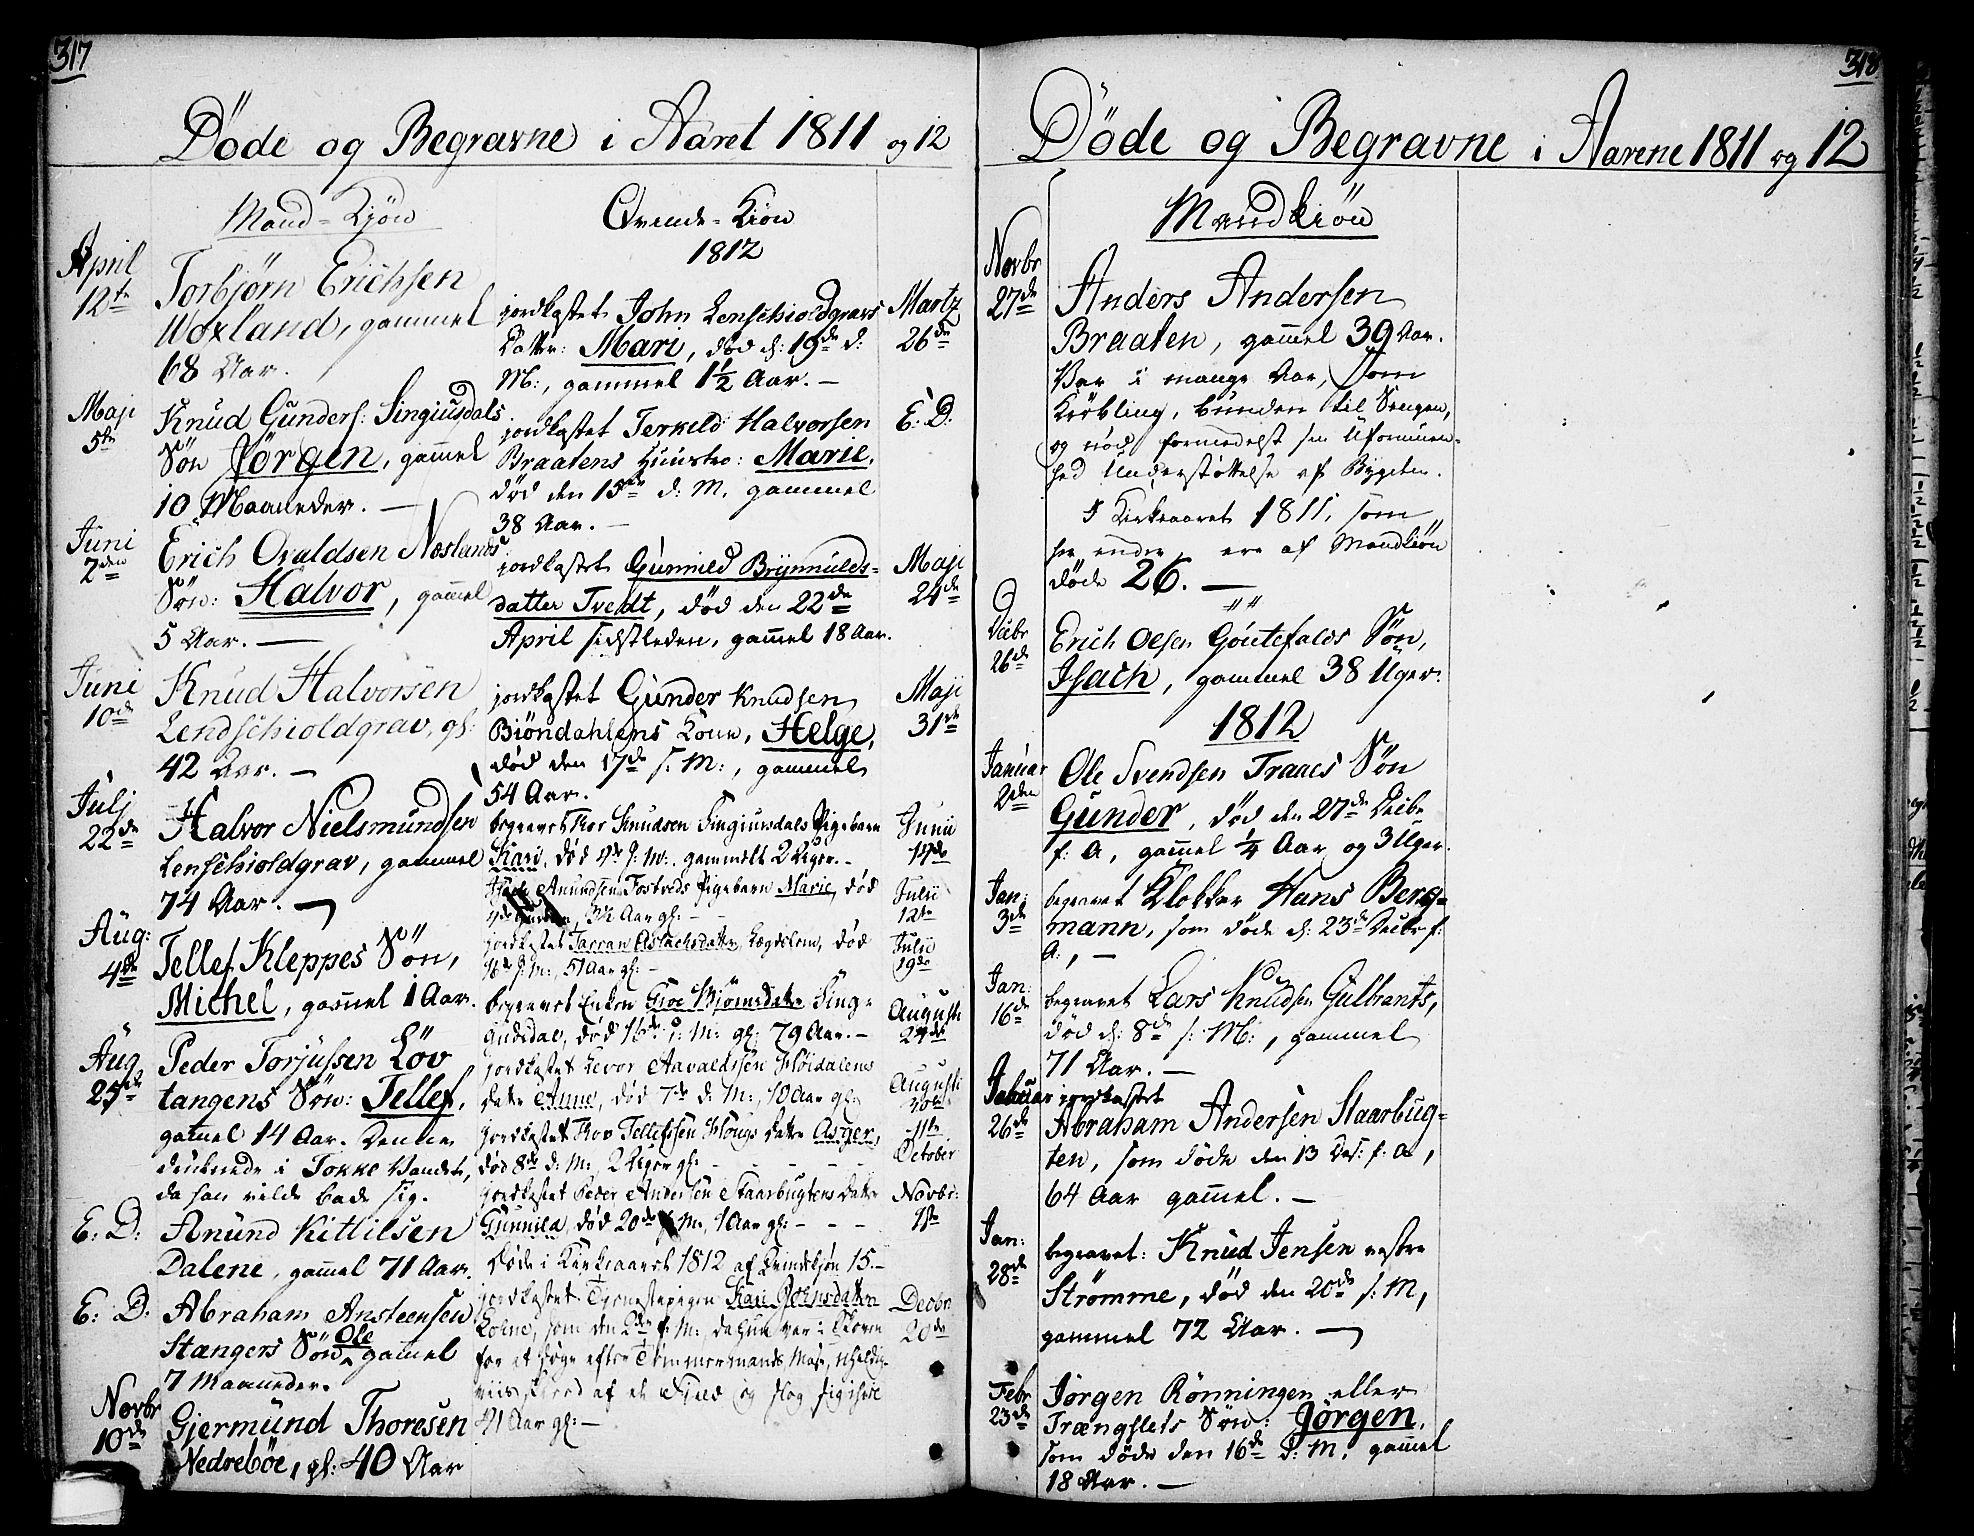 SAKO, Drangedal kirkebøker, F/Fa/L0003: Ministerialbok nr. 3, 1768-1814, s. 317-318